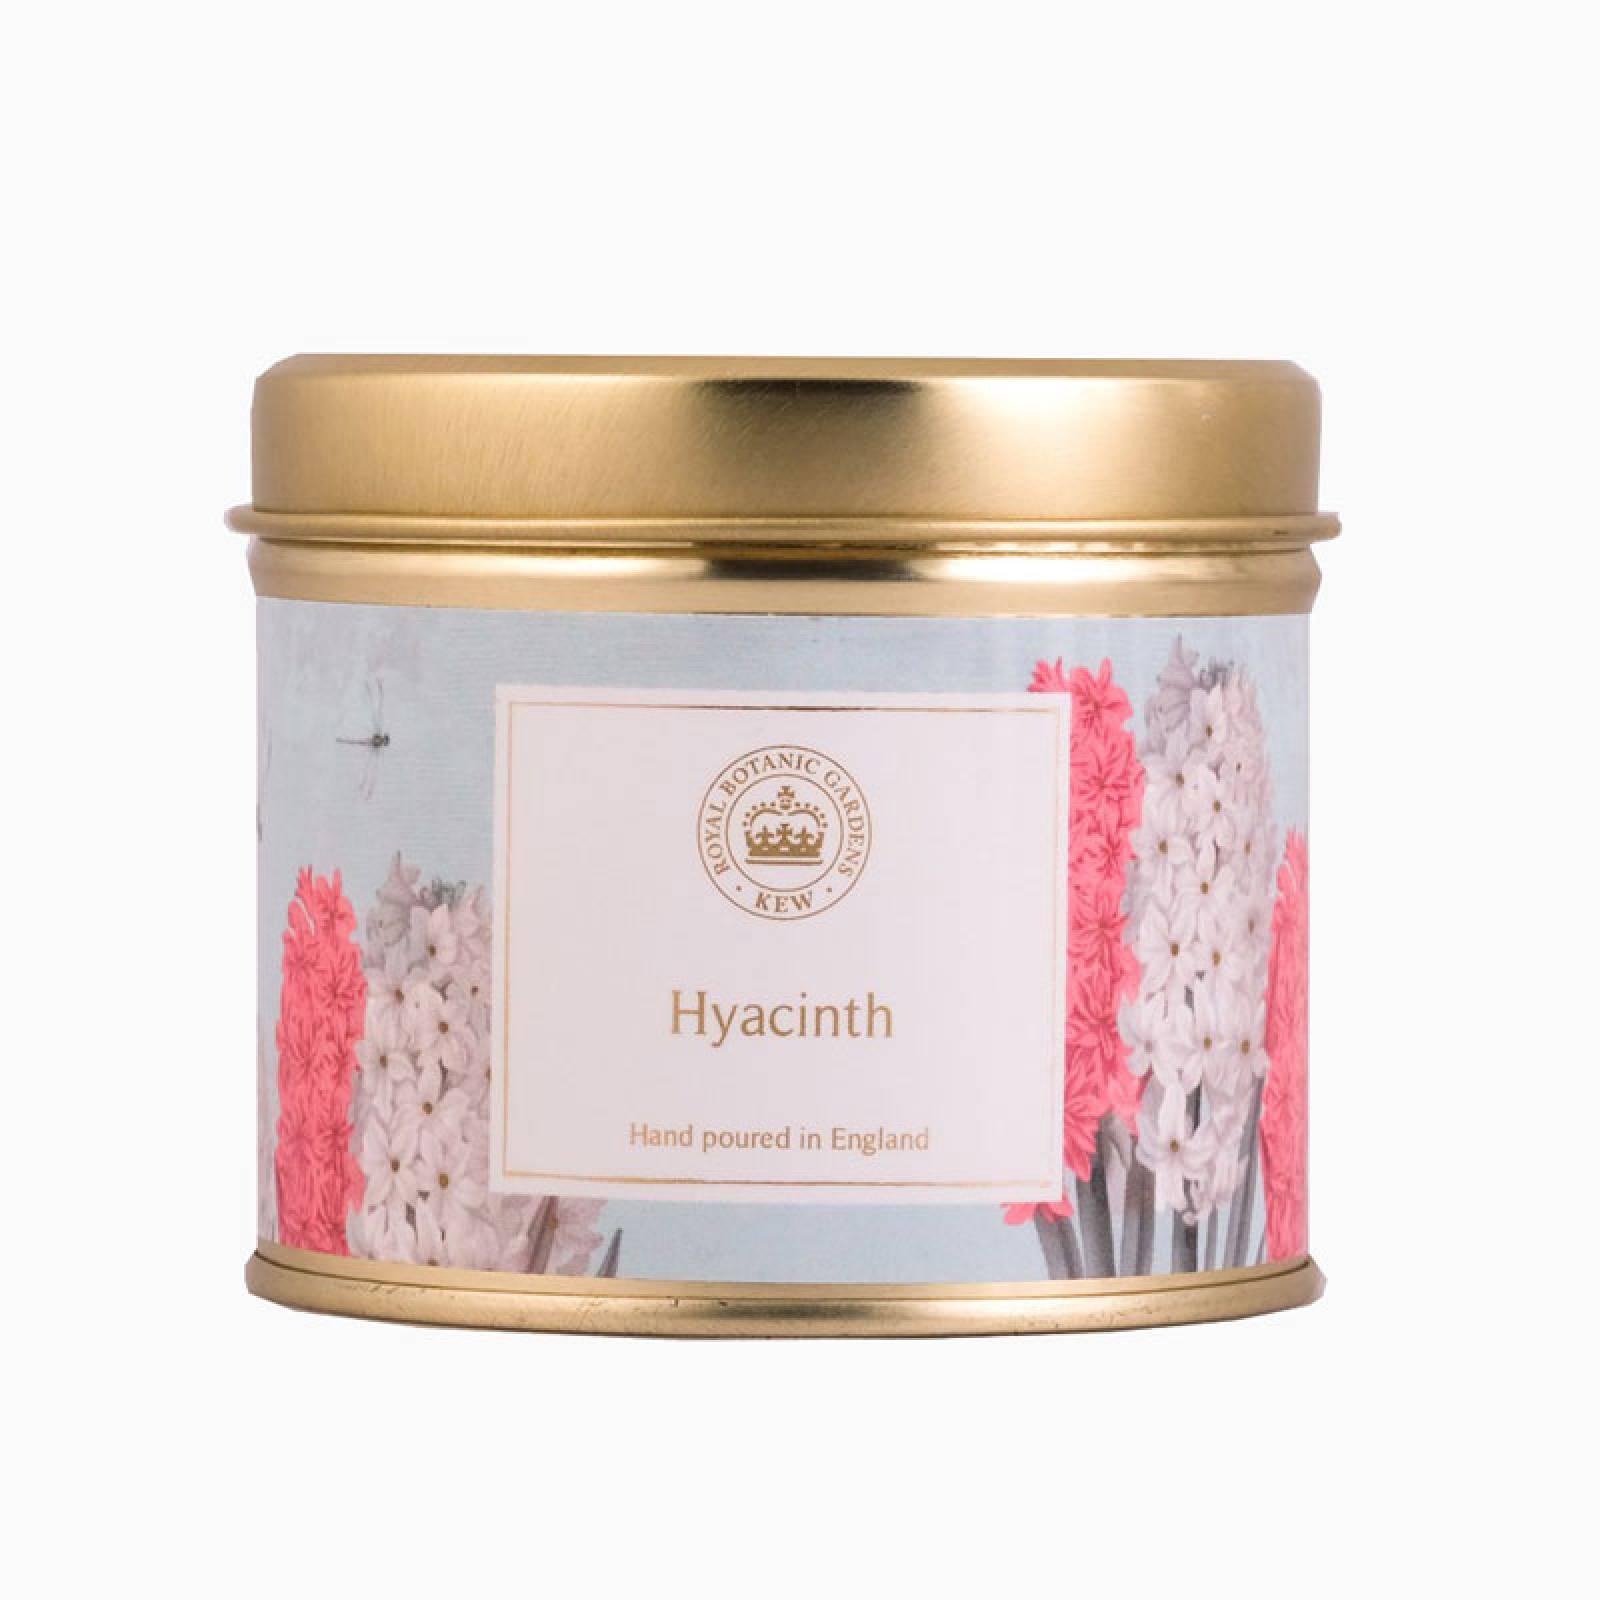 Hyacinth Kew Aromatics Candle In Tin 160g